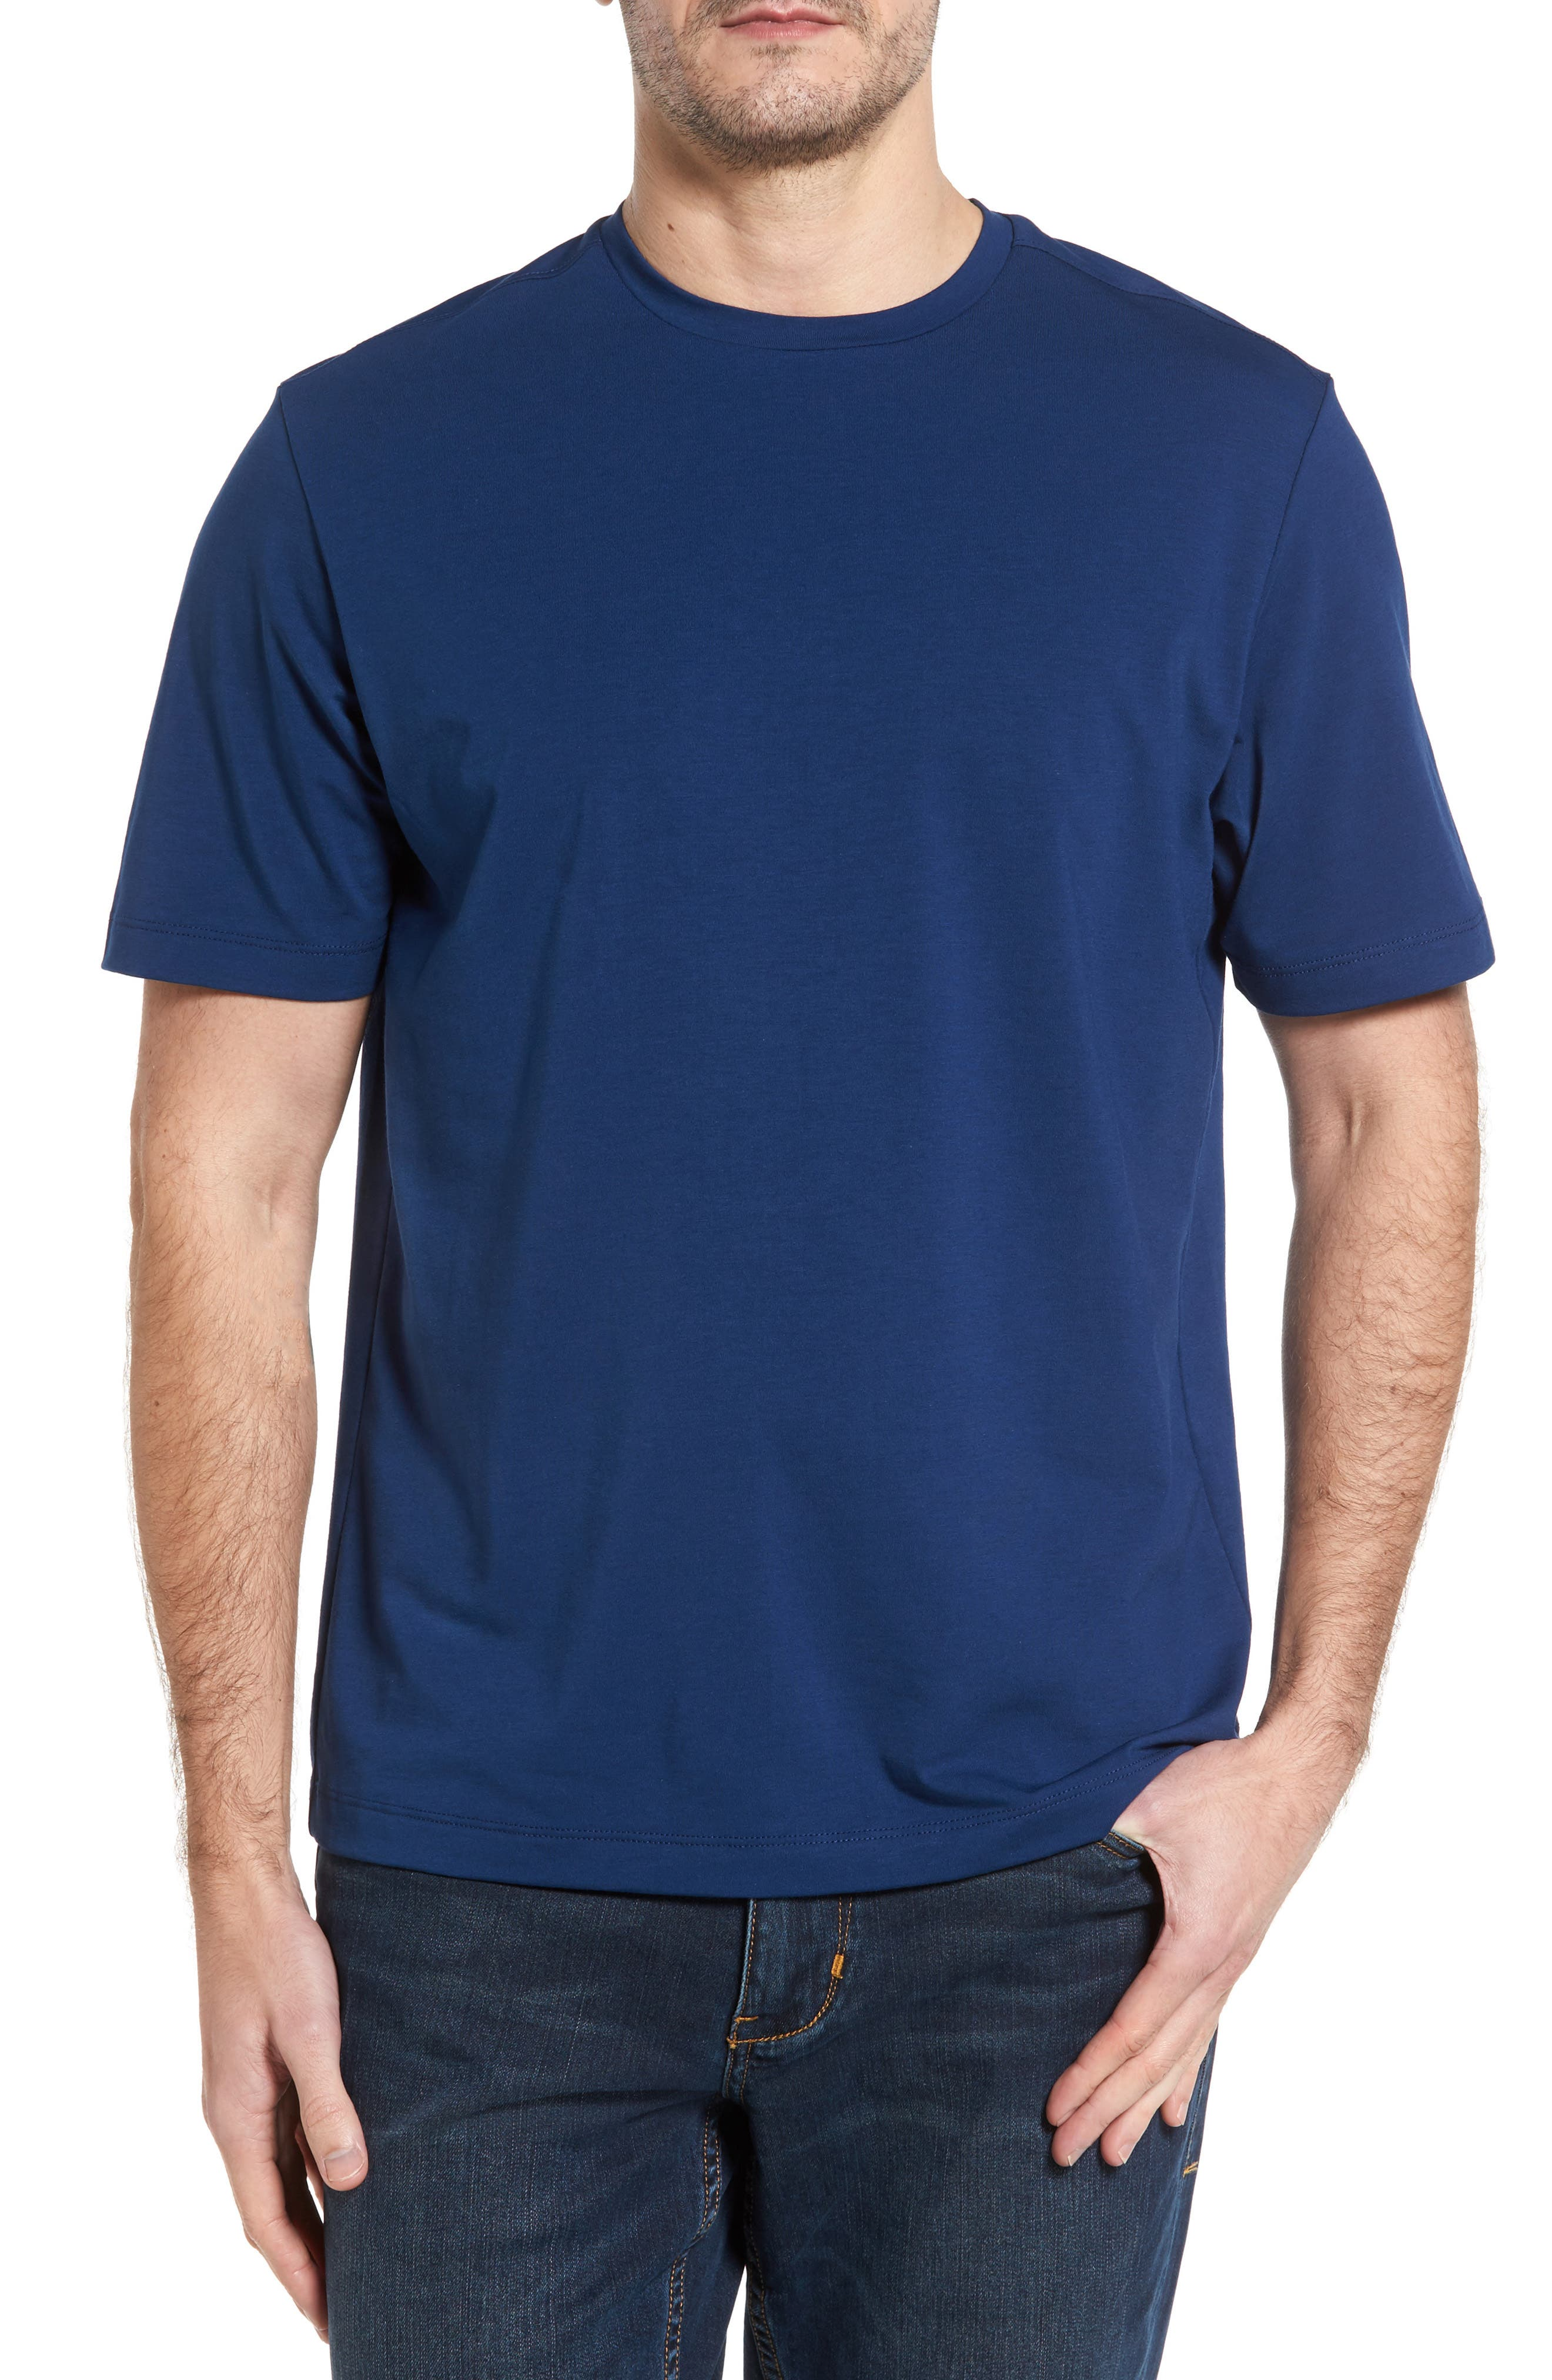 Tropicool T-Shirt,                             Main thumbnail 9, color,